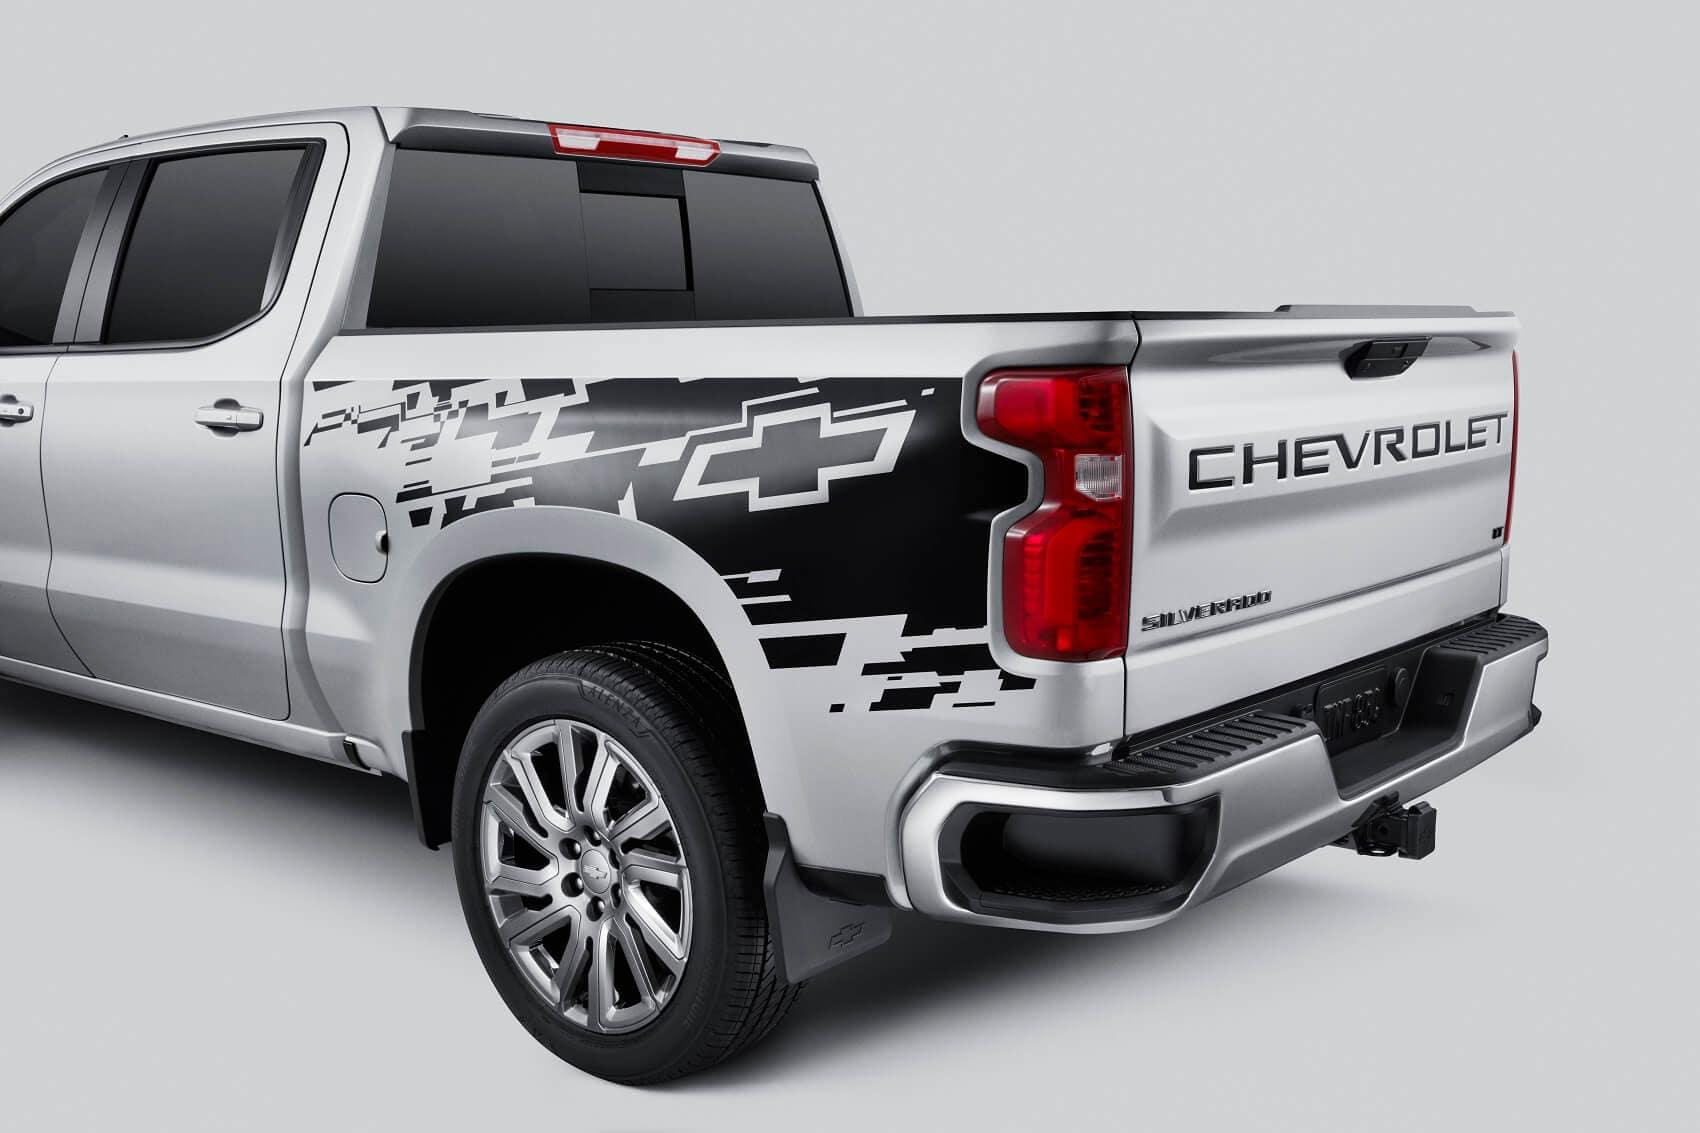 2019 CHEVROLET SILVERADO 1500 VS NISSAN TITAN: SAFETY